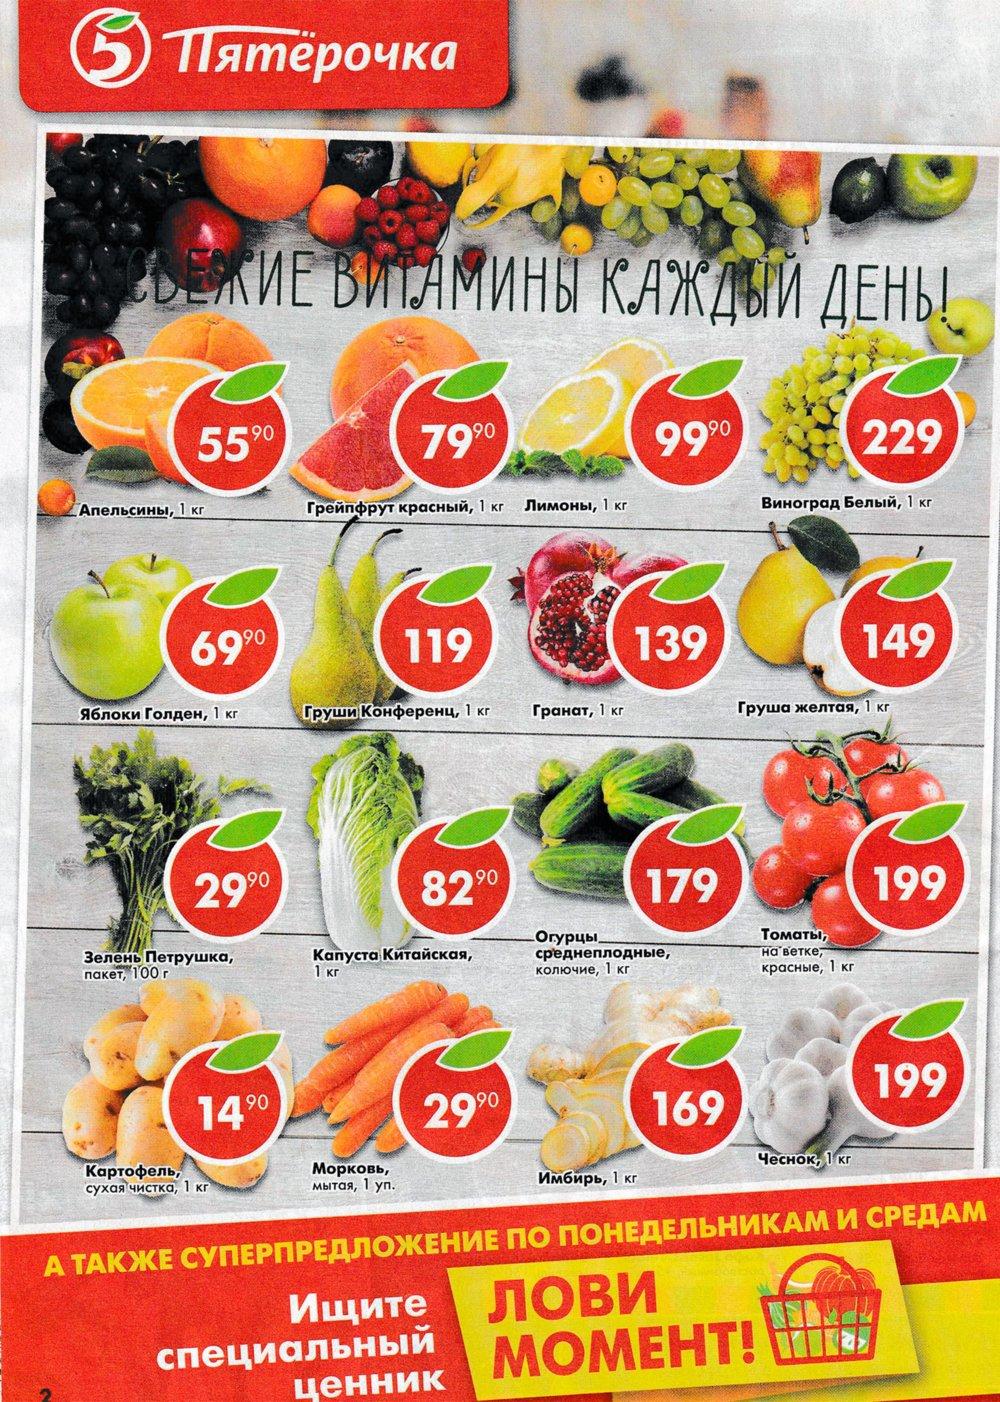 Каталог акций со скидками на товары магазина Лента сегодня (июнь 2018  года). Выручай-КАрта www.5ka.ru card. Не так давно aa17ace5d3800